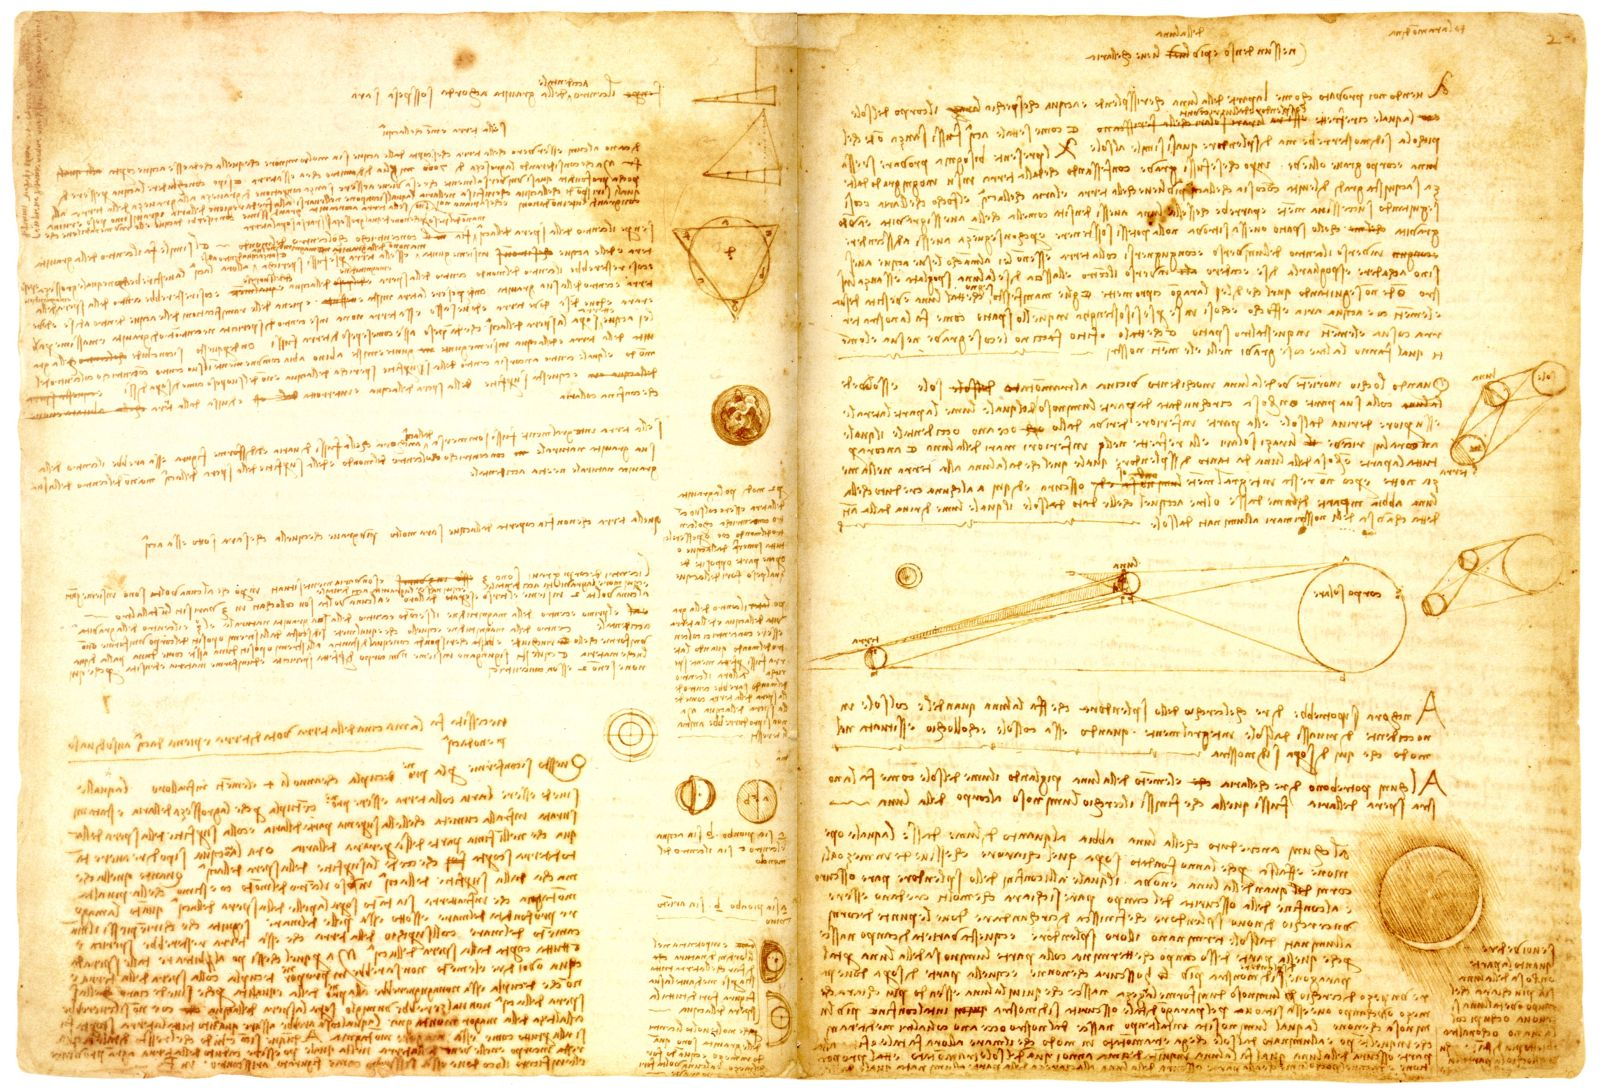 Ukázka da Vinciho zrcadlového písma.